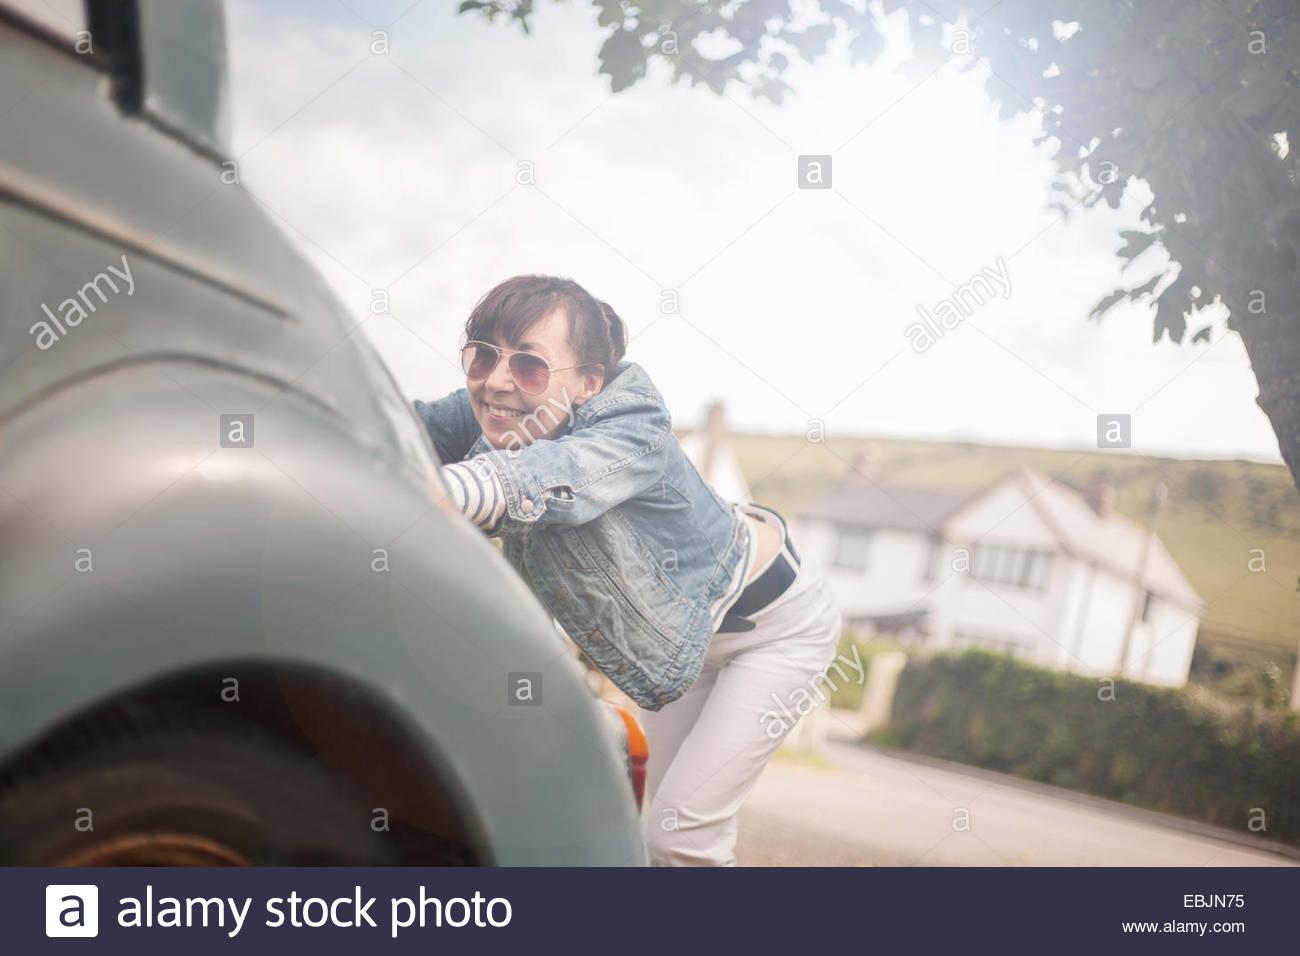 Woman pushing broken down car Stock Photo